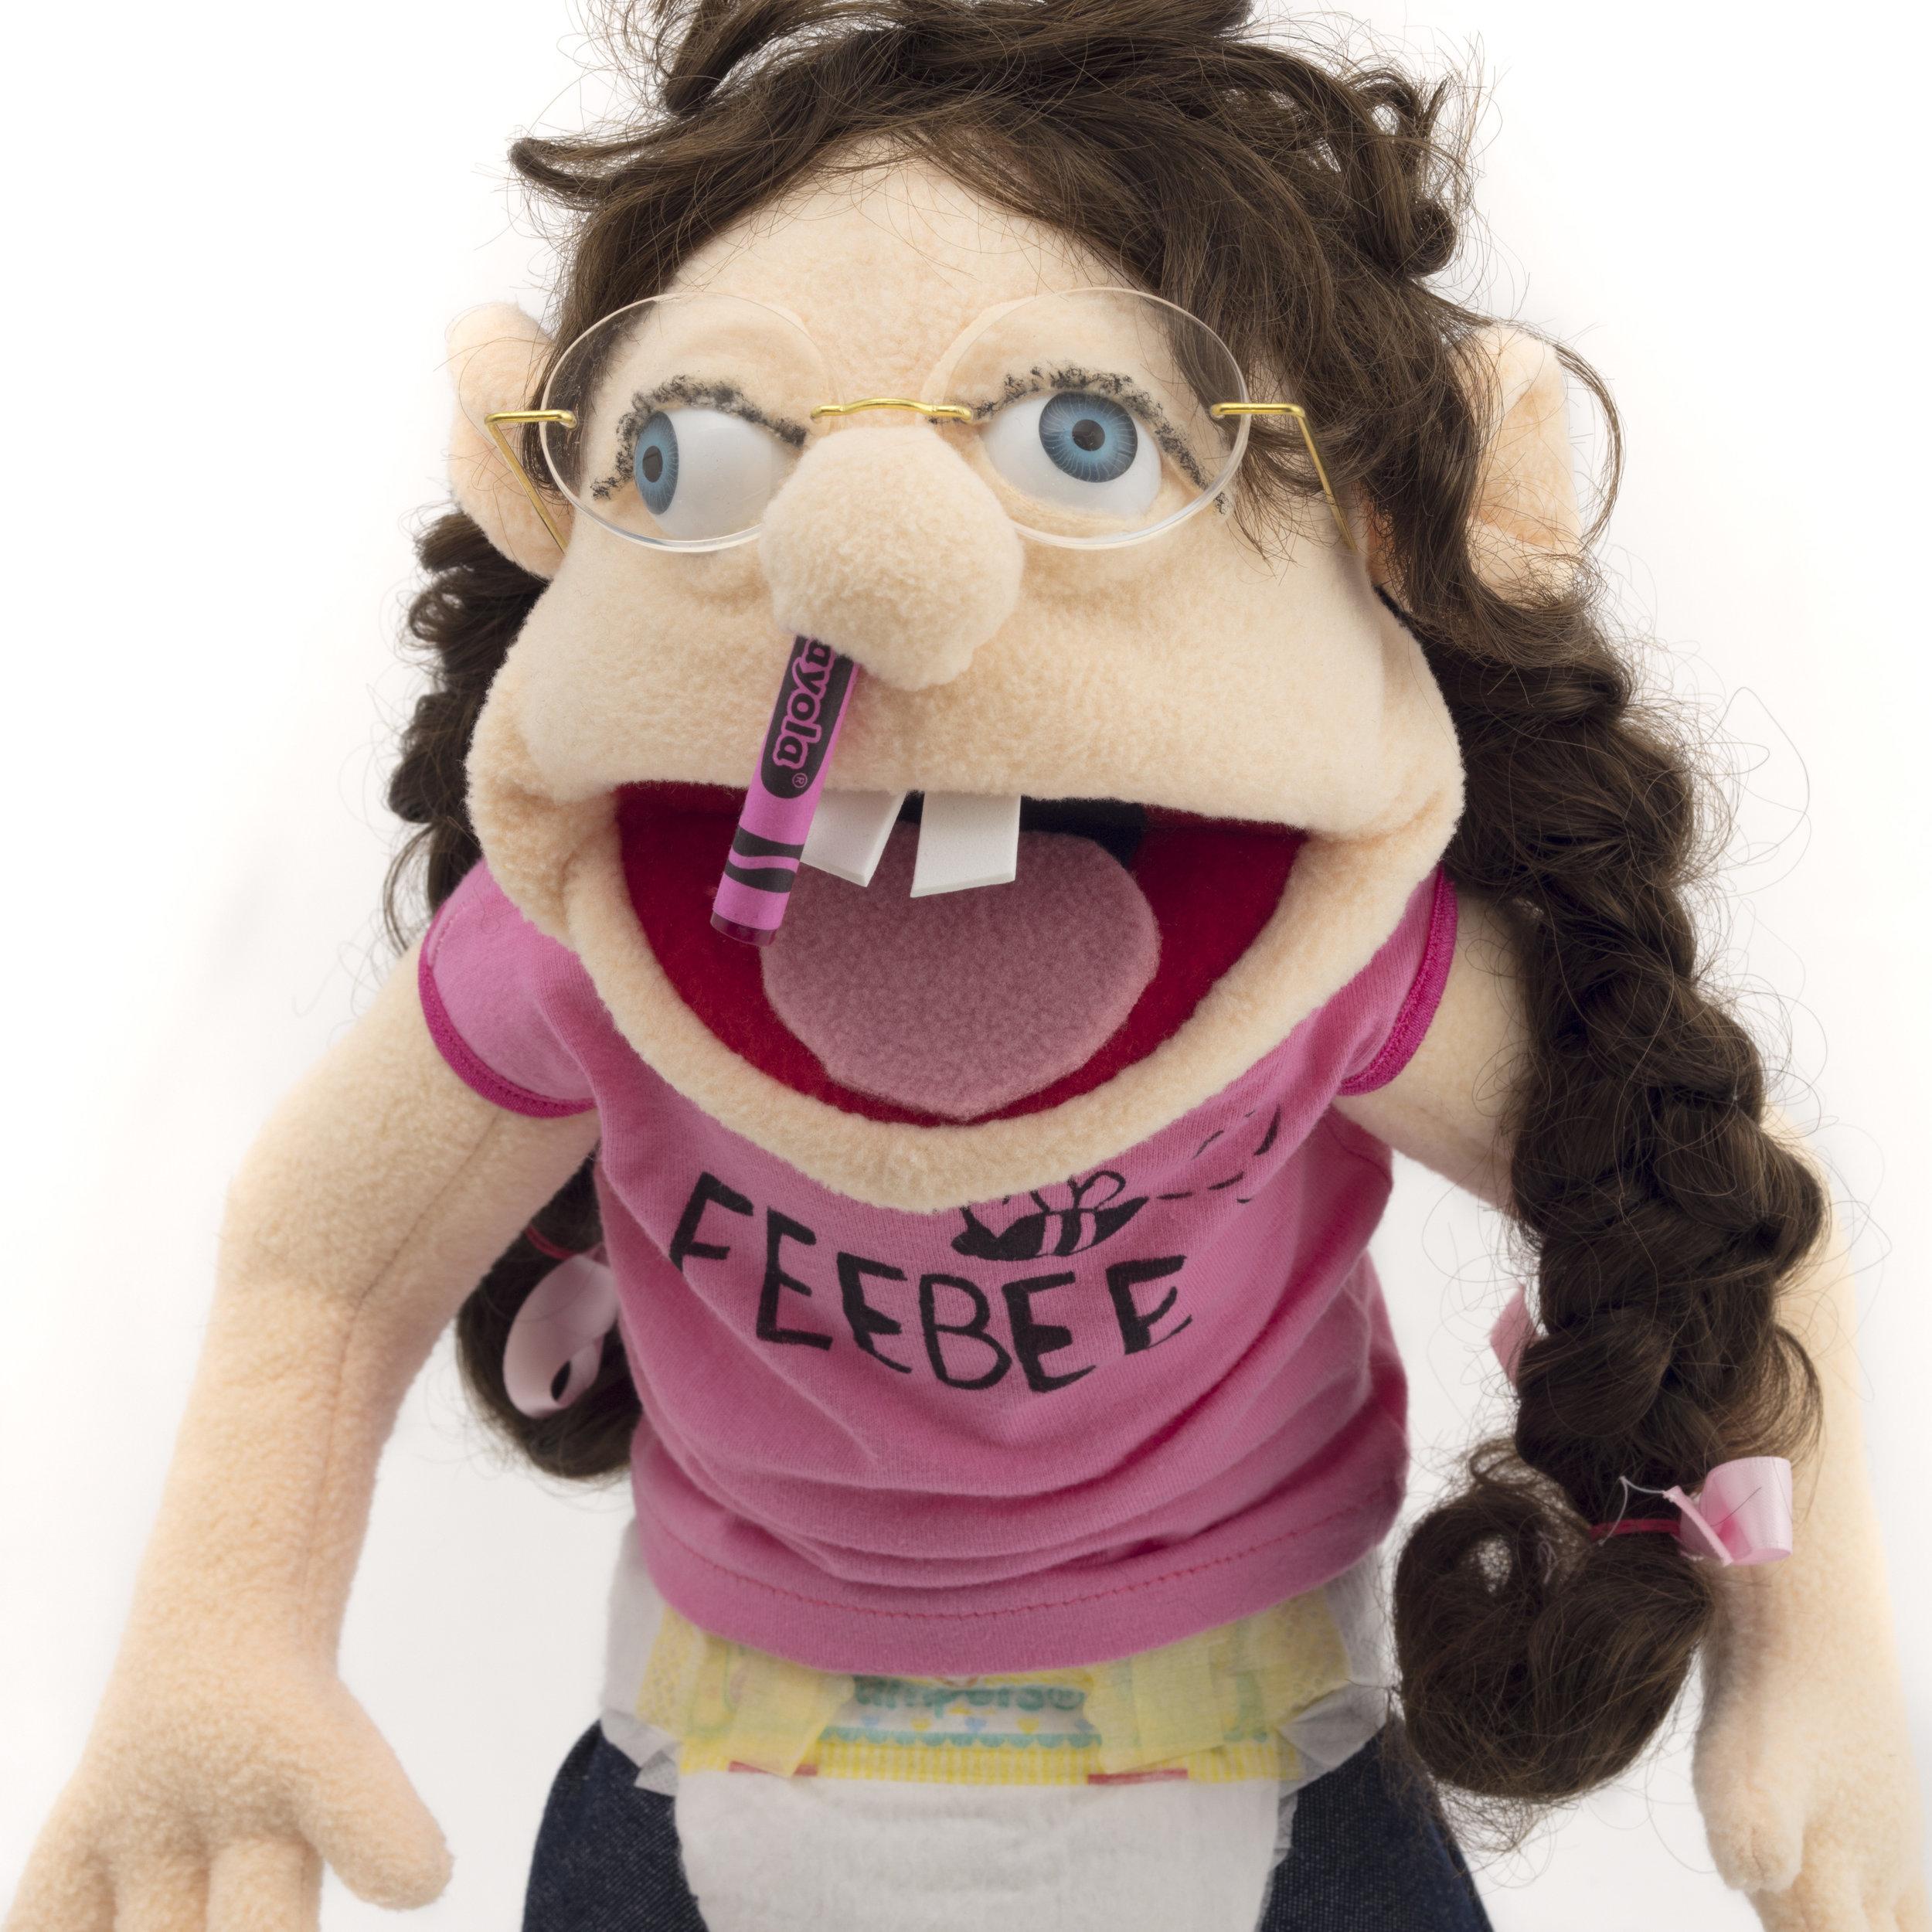 Feebee-2-2.jpg